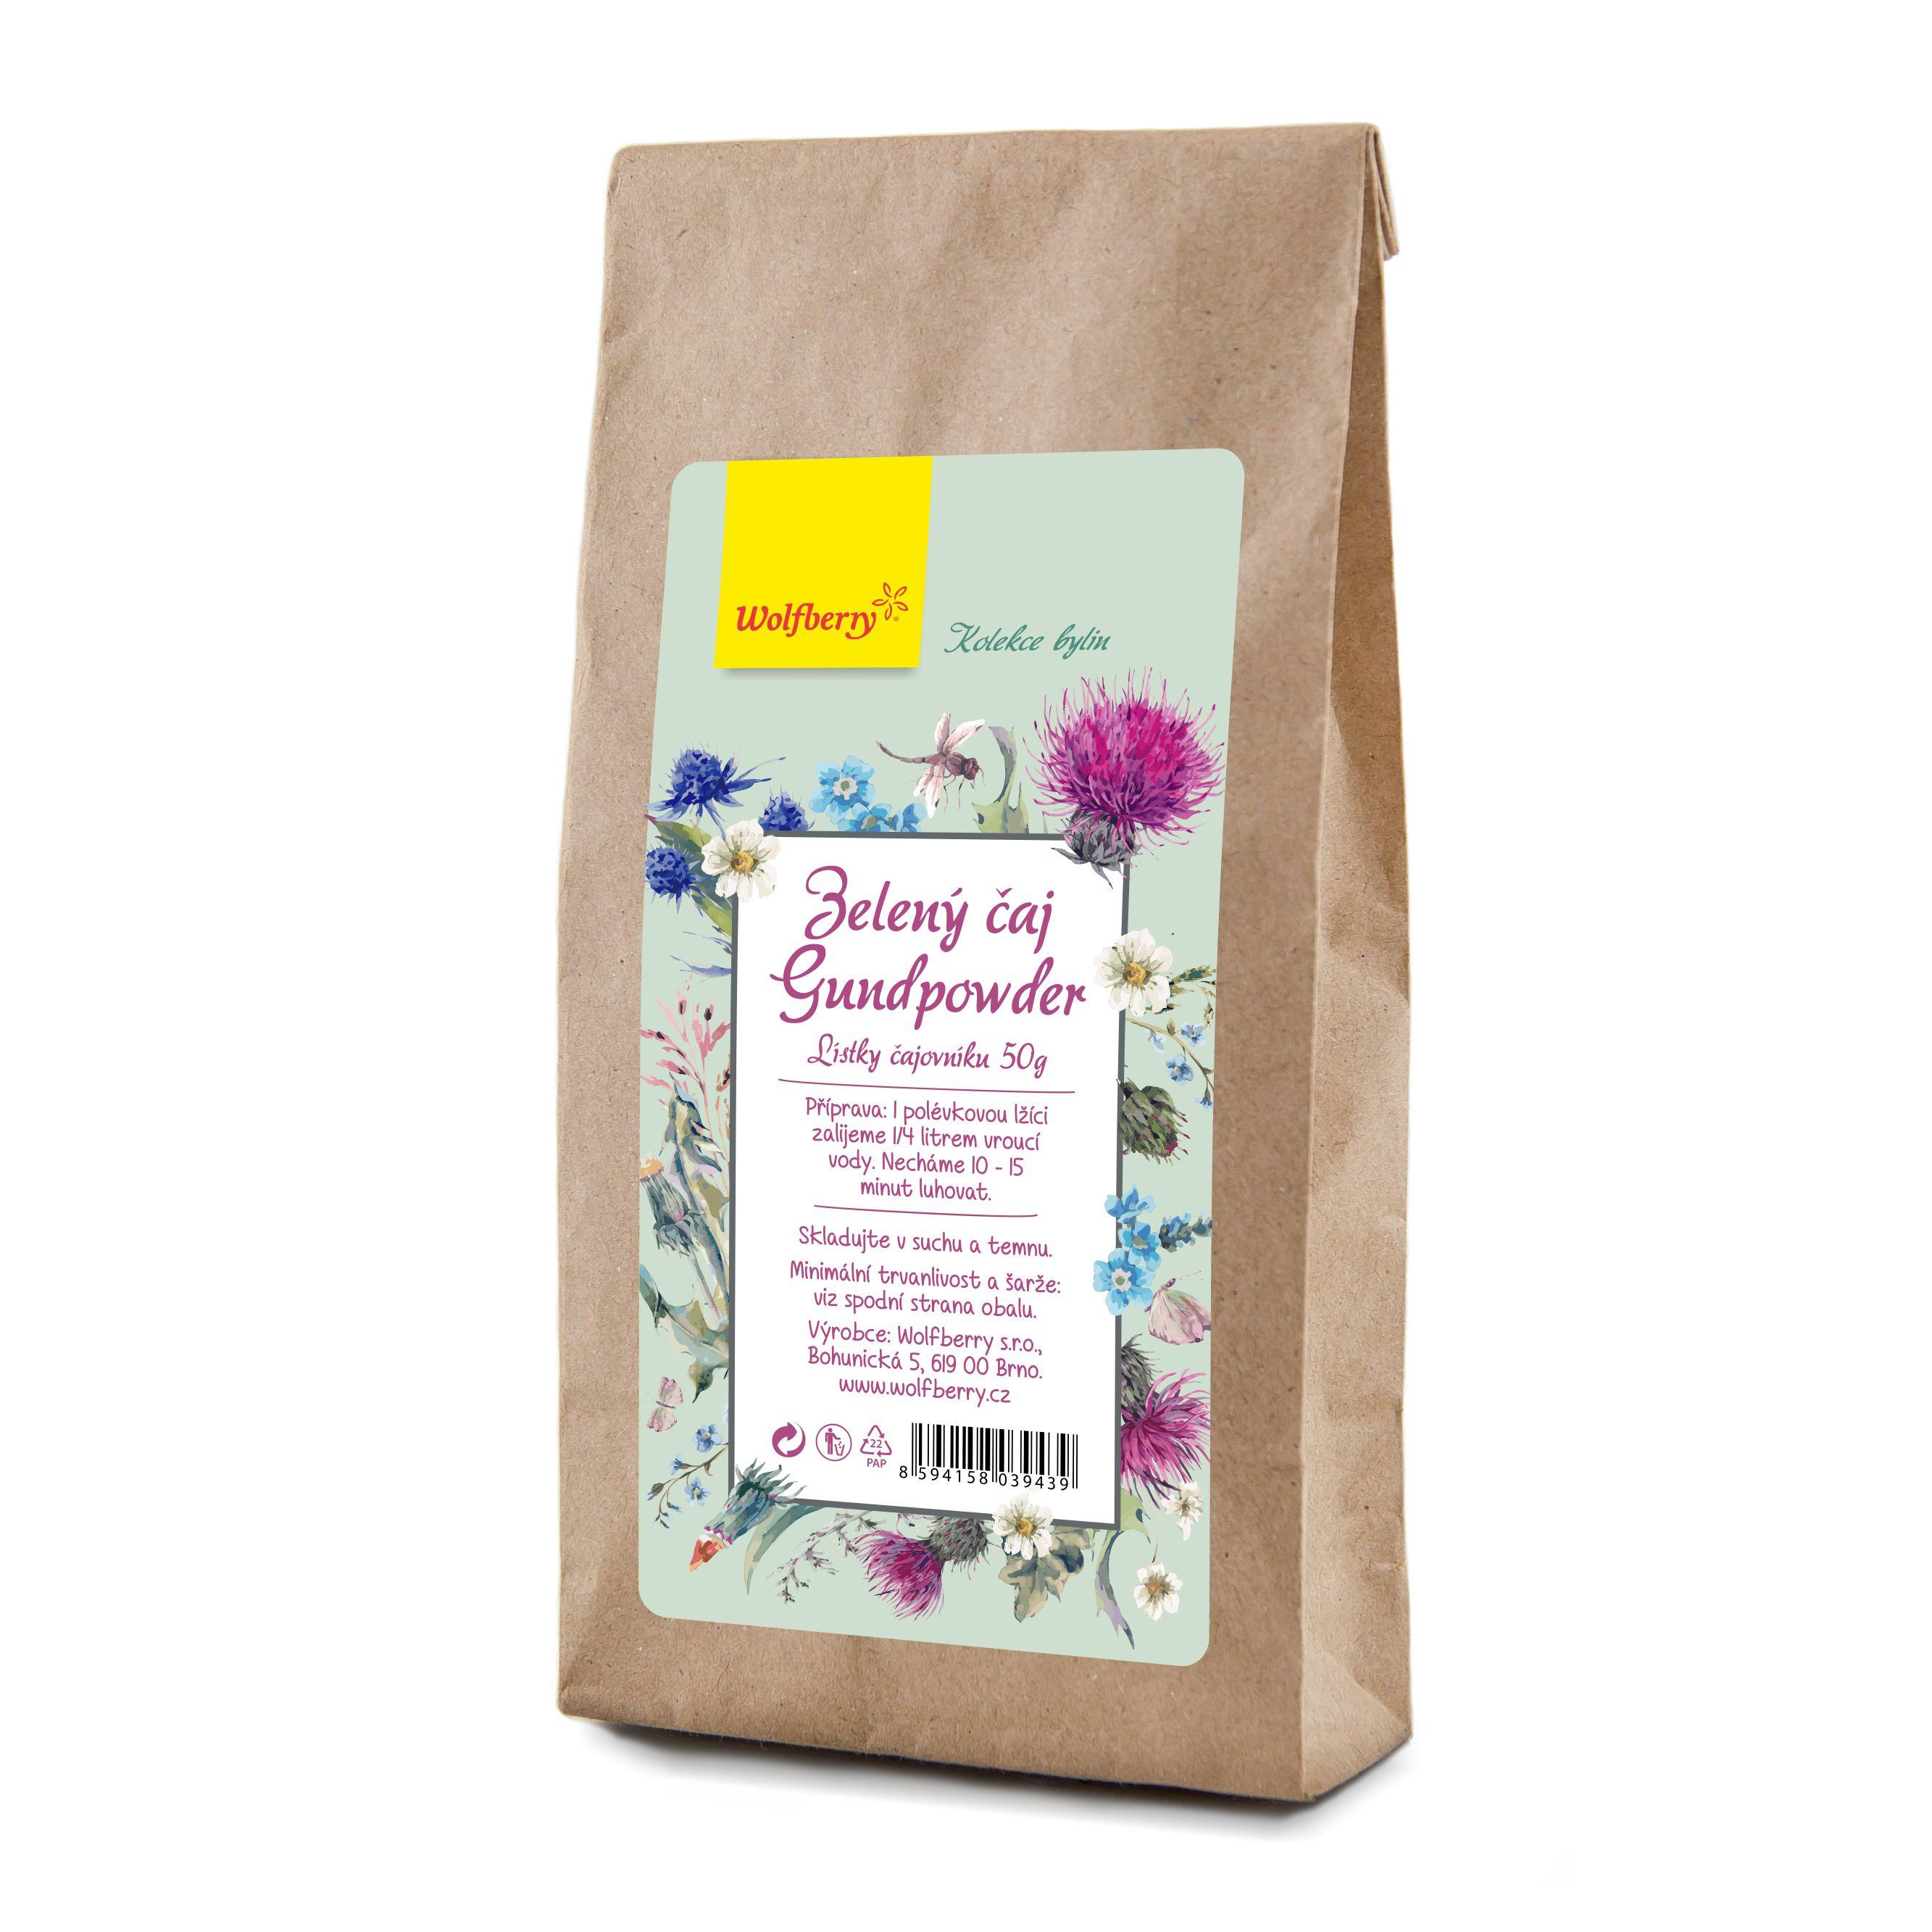 Wolfberry Zelený čaj gundpowder 50 g Wolfberry 50 g